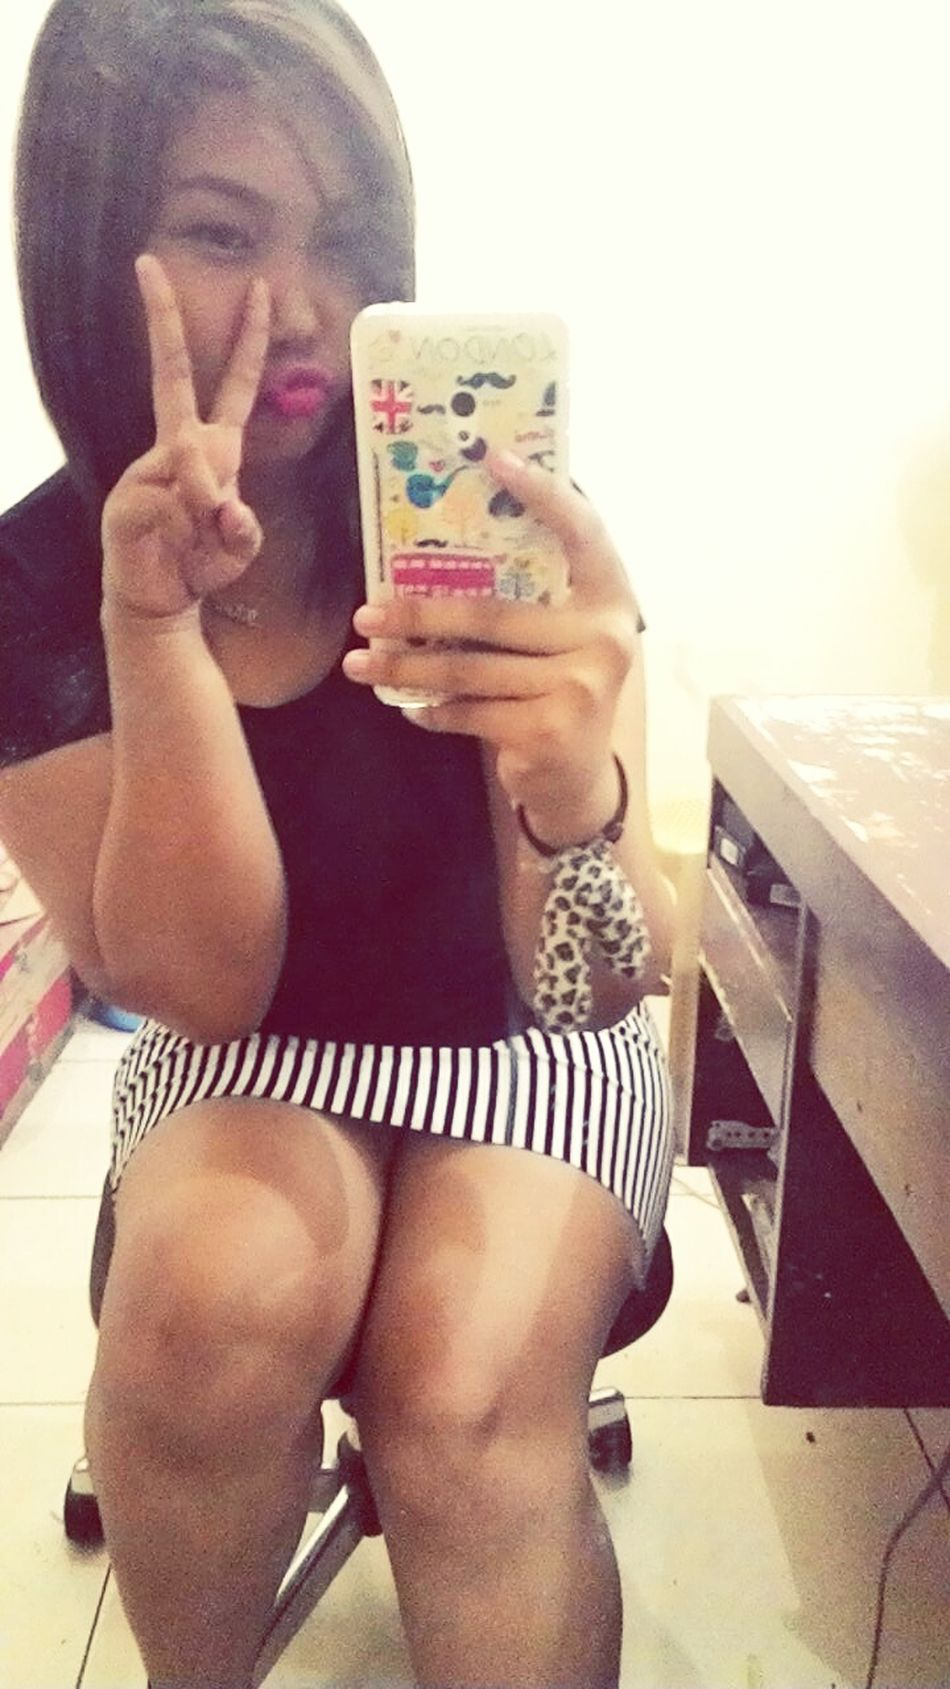 Selfie Time Mirrorselfie Signpose Peace!